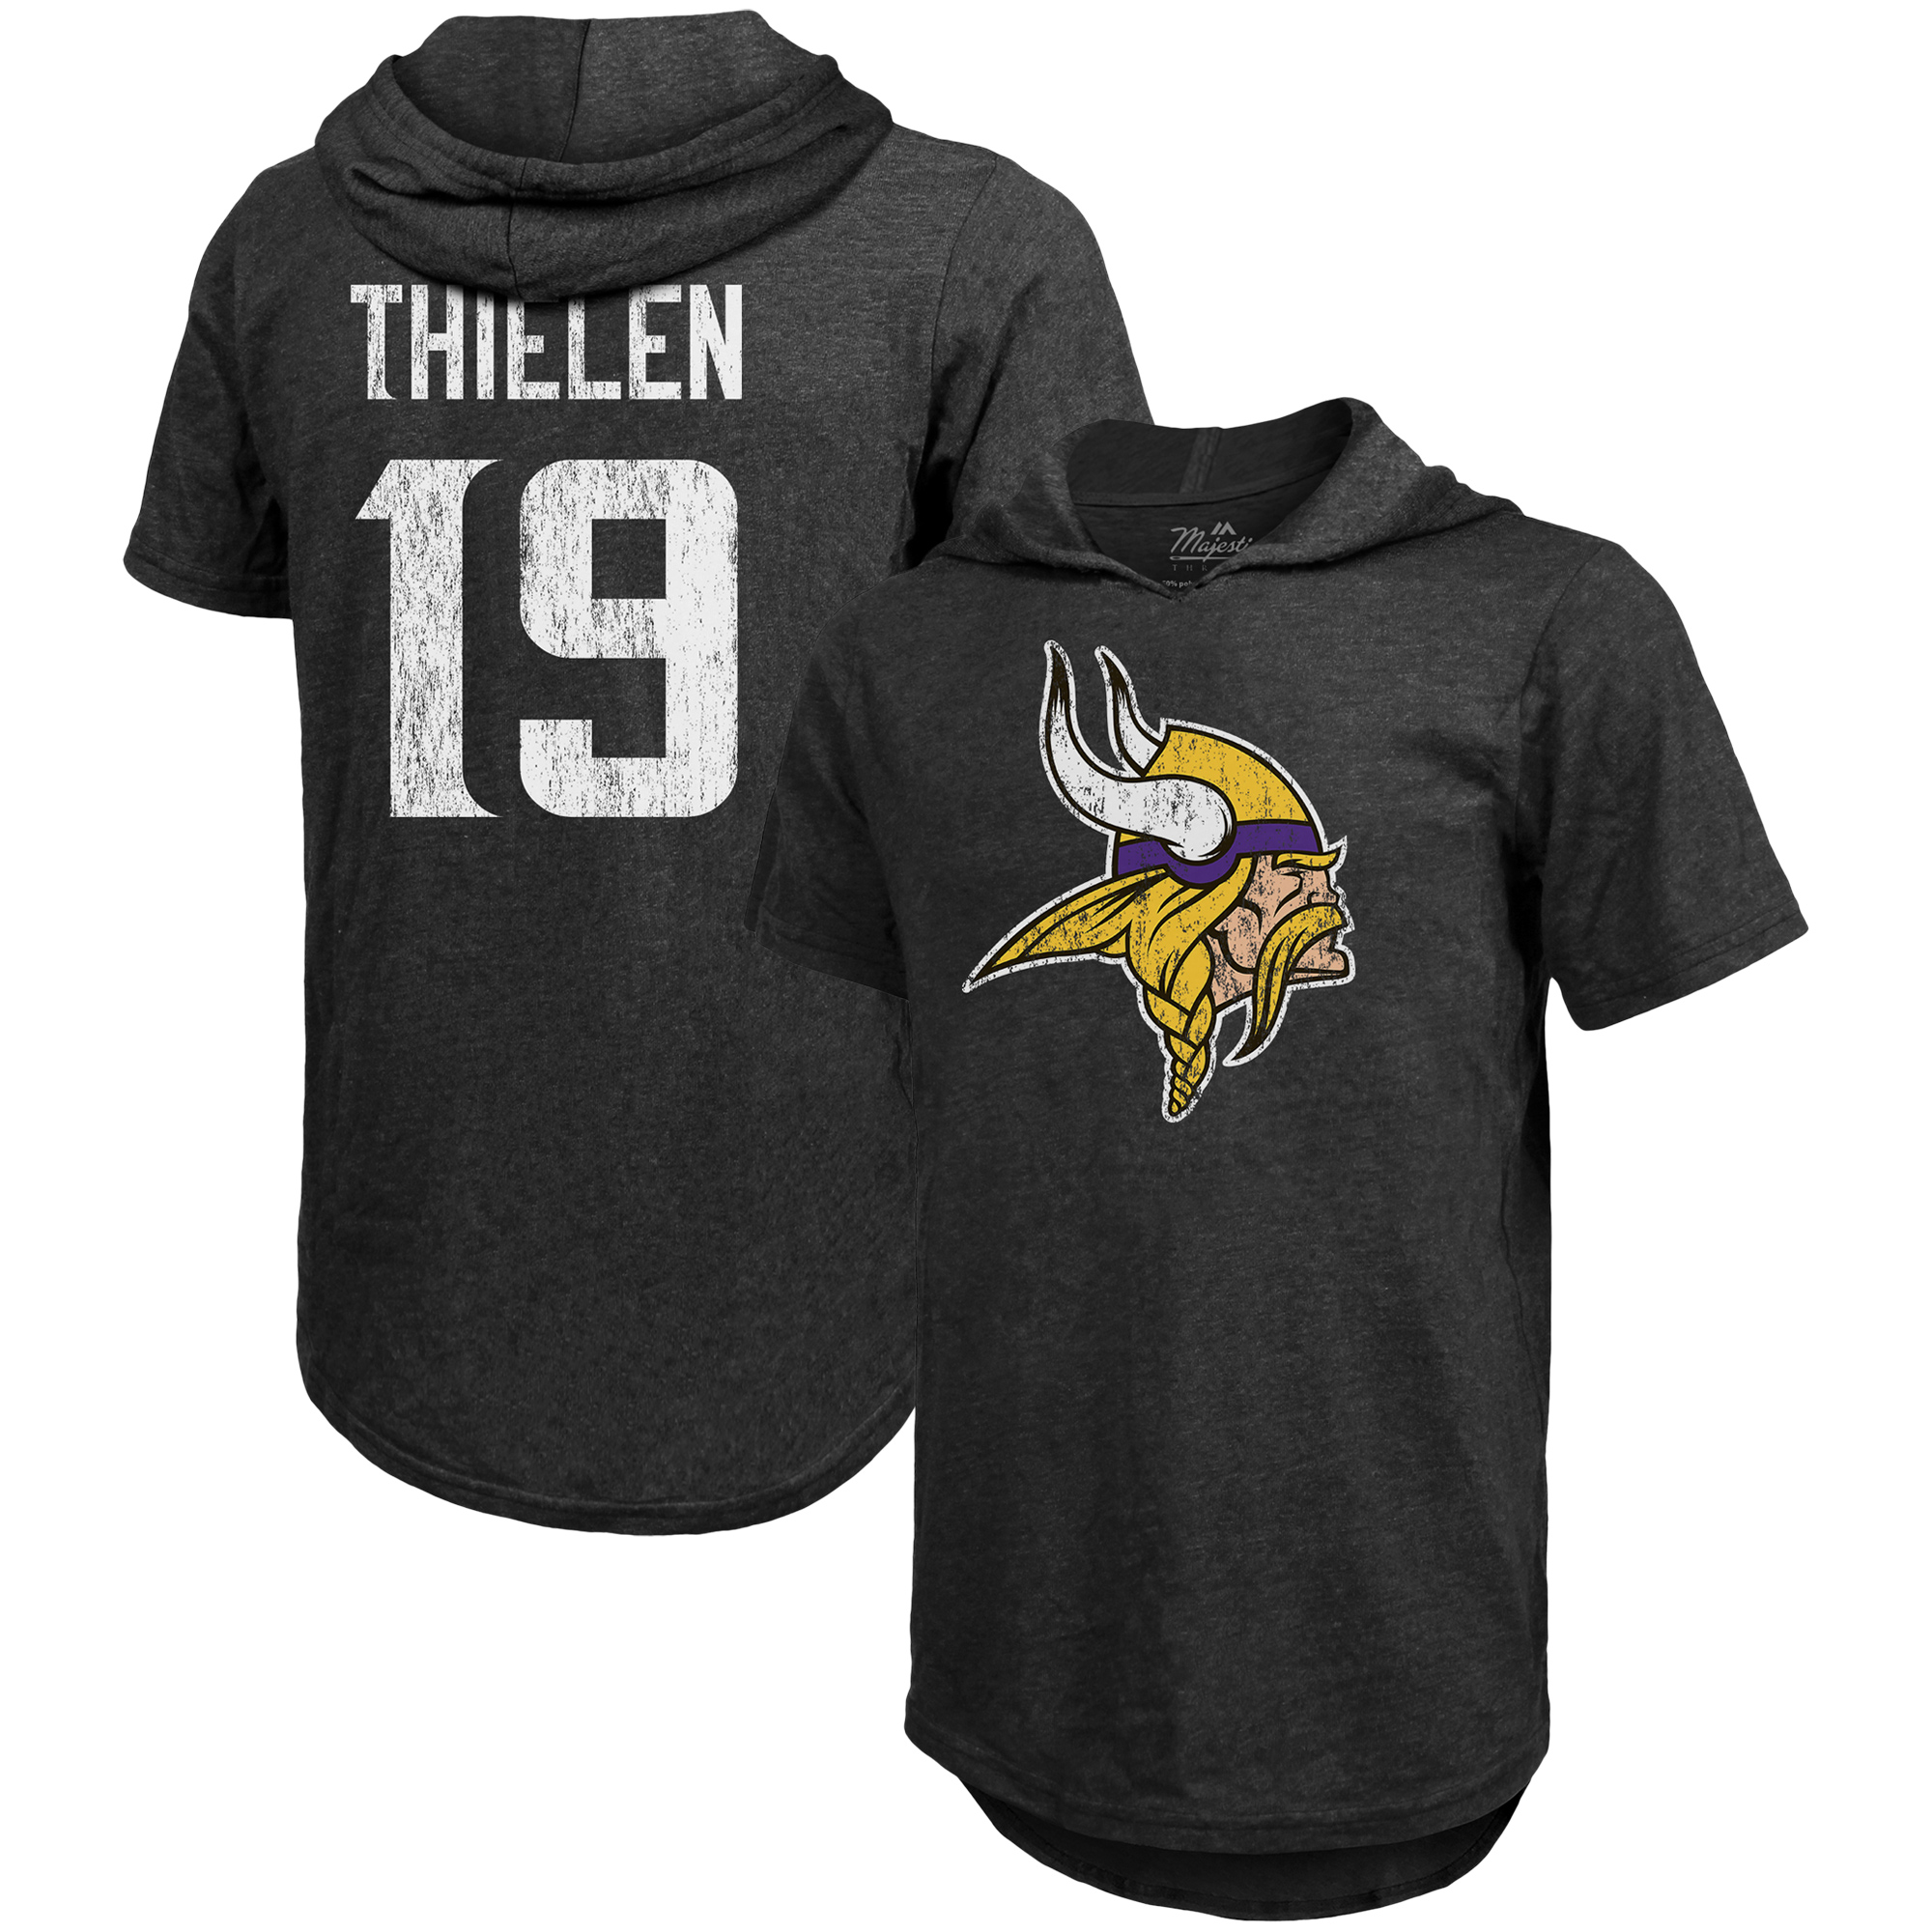 Adam Thielen Minnesota Vikings Majestic Threads Tri-Blend Hooded Name & Number T-Shirt - Black